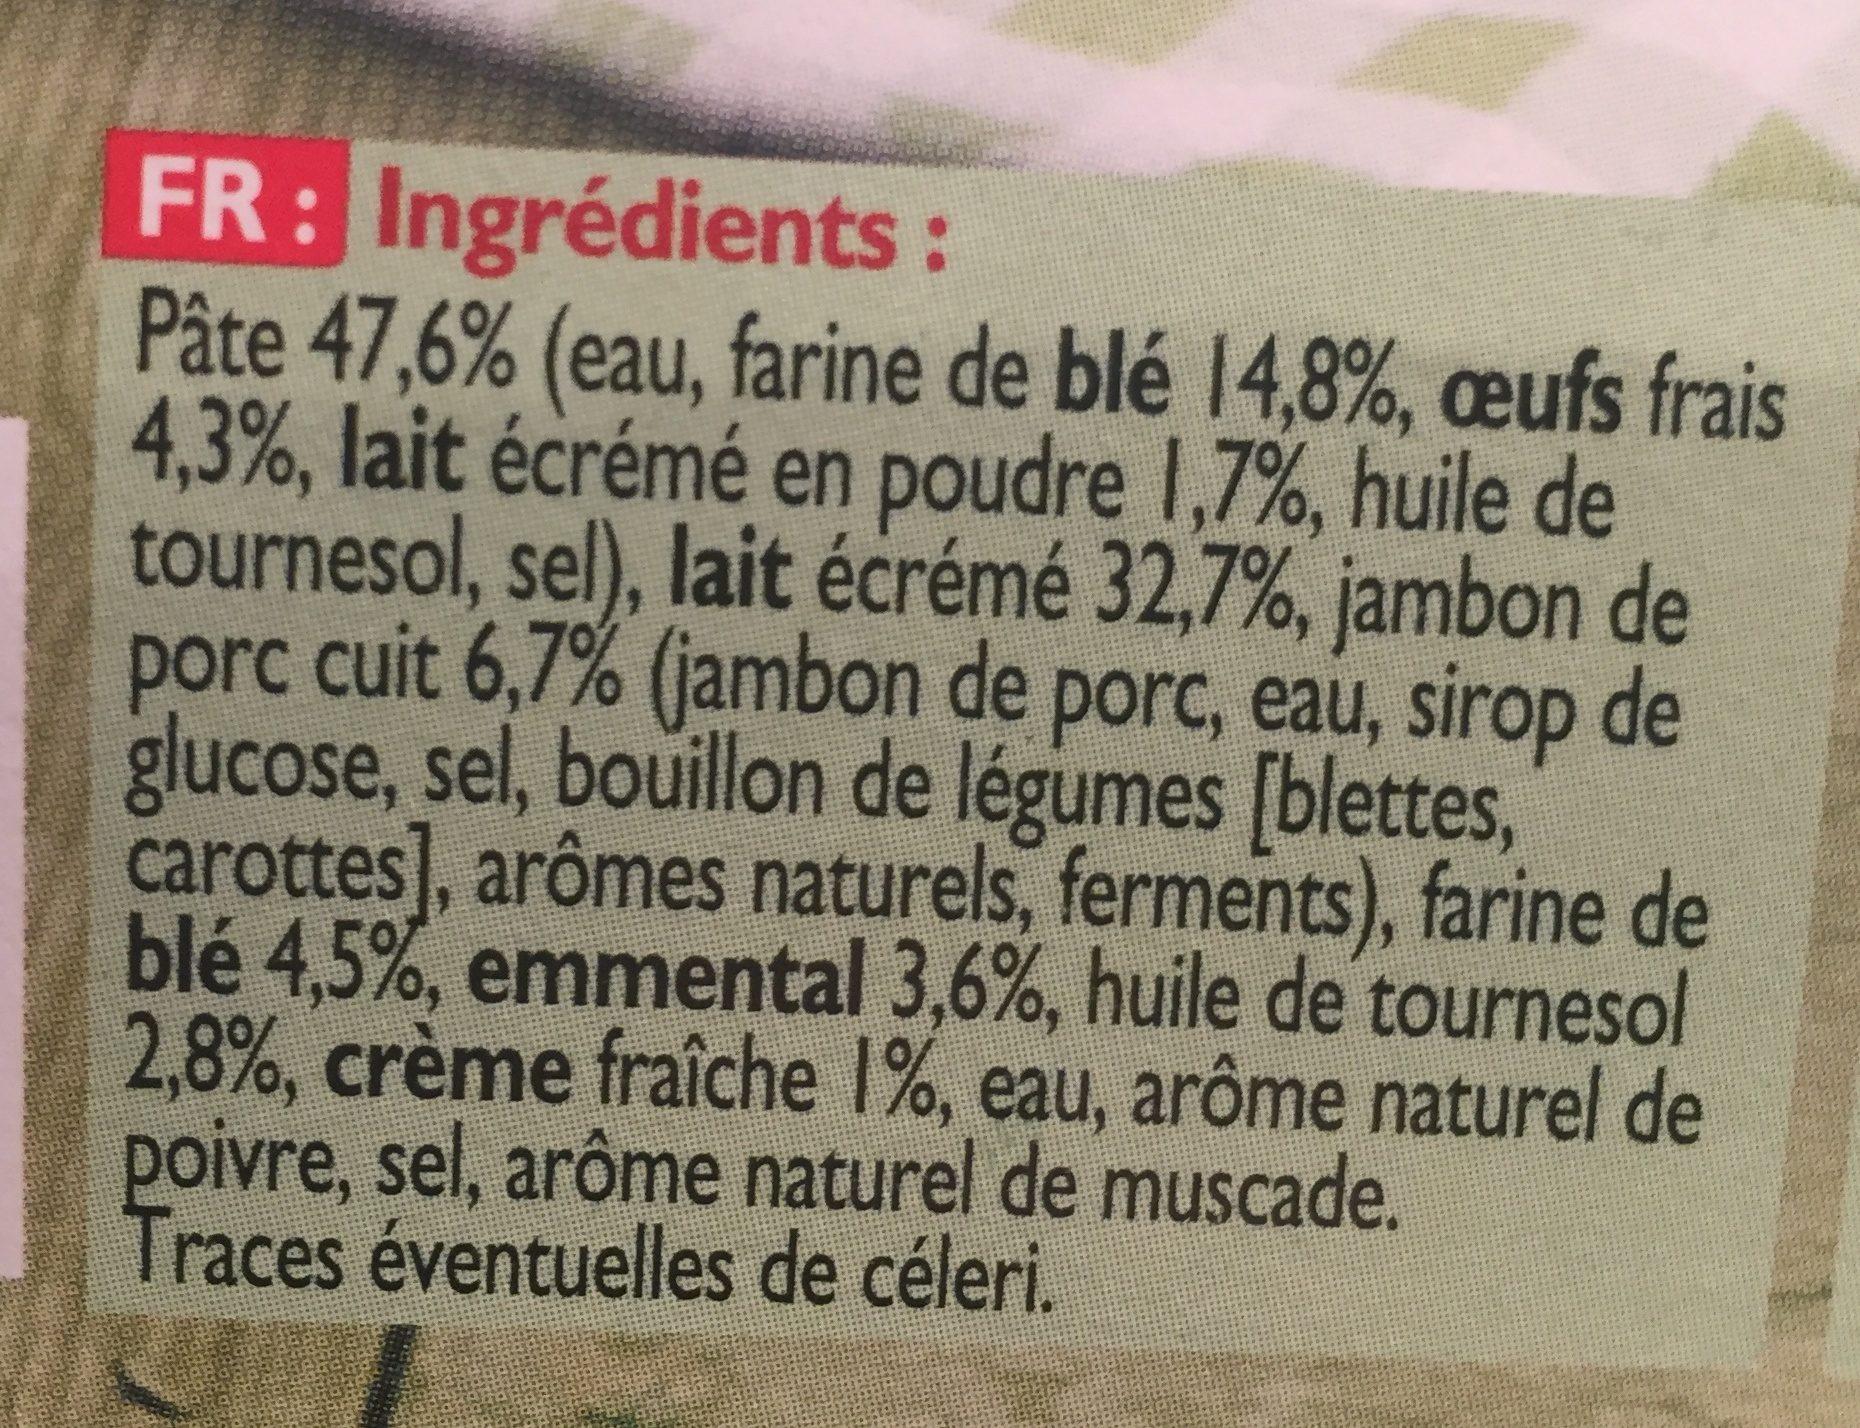 6 crepes roulees jambon et fromages - Ingrédients - fr